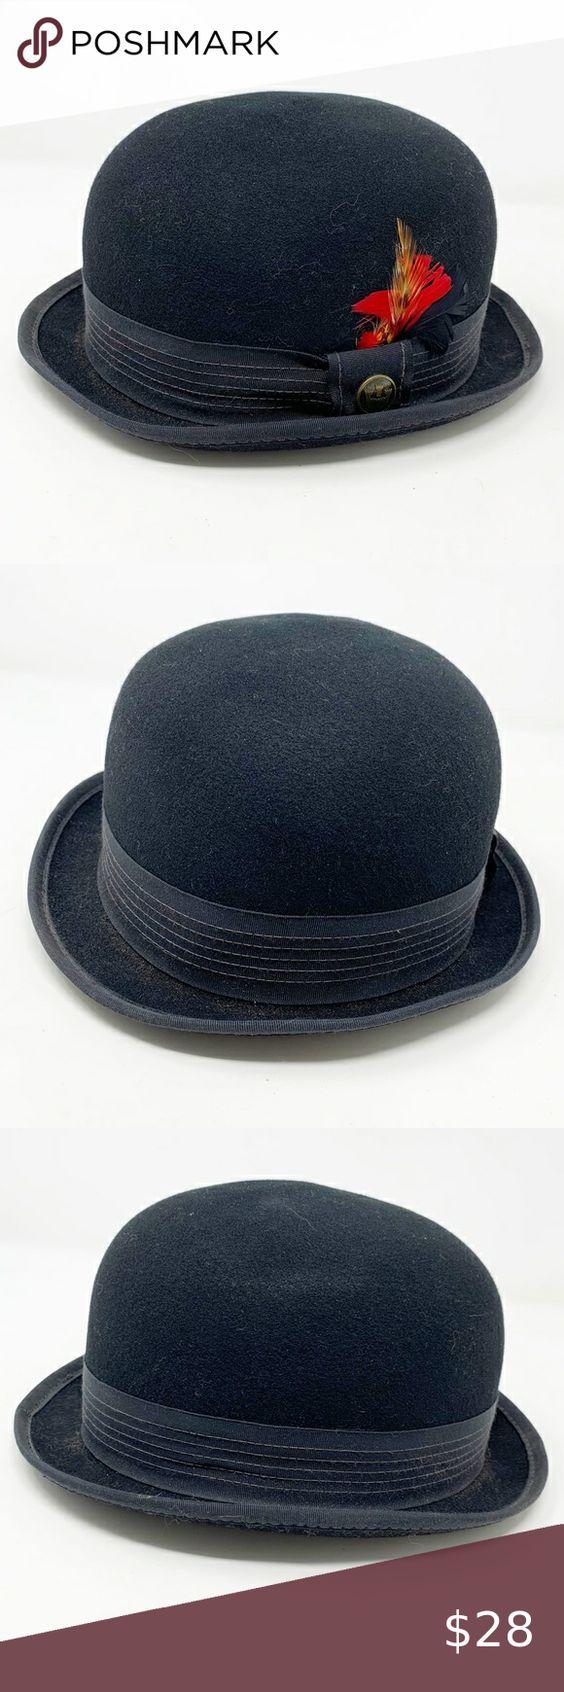 Goorin Bros Black Wool Bowler Hat Feather In 2021 Goorin Bowler Hat Black Wool